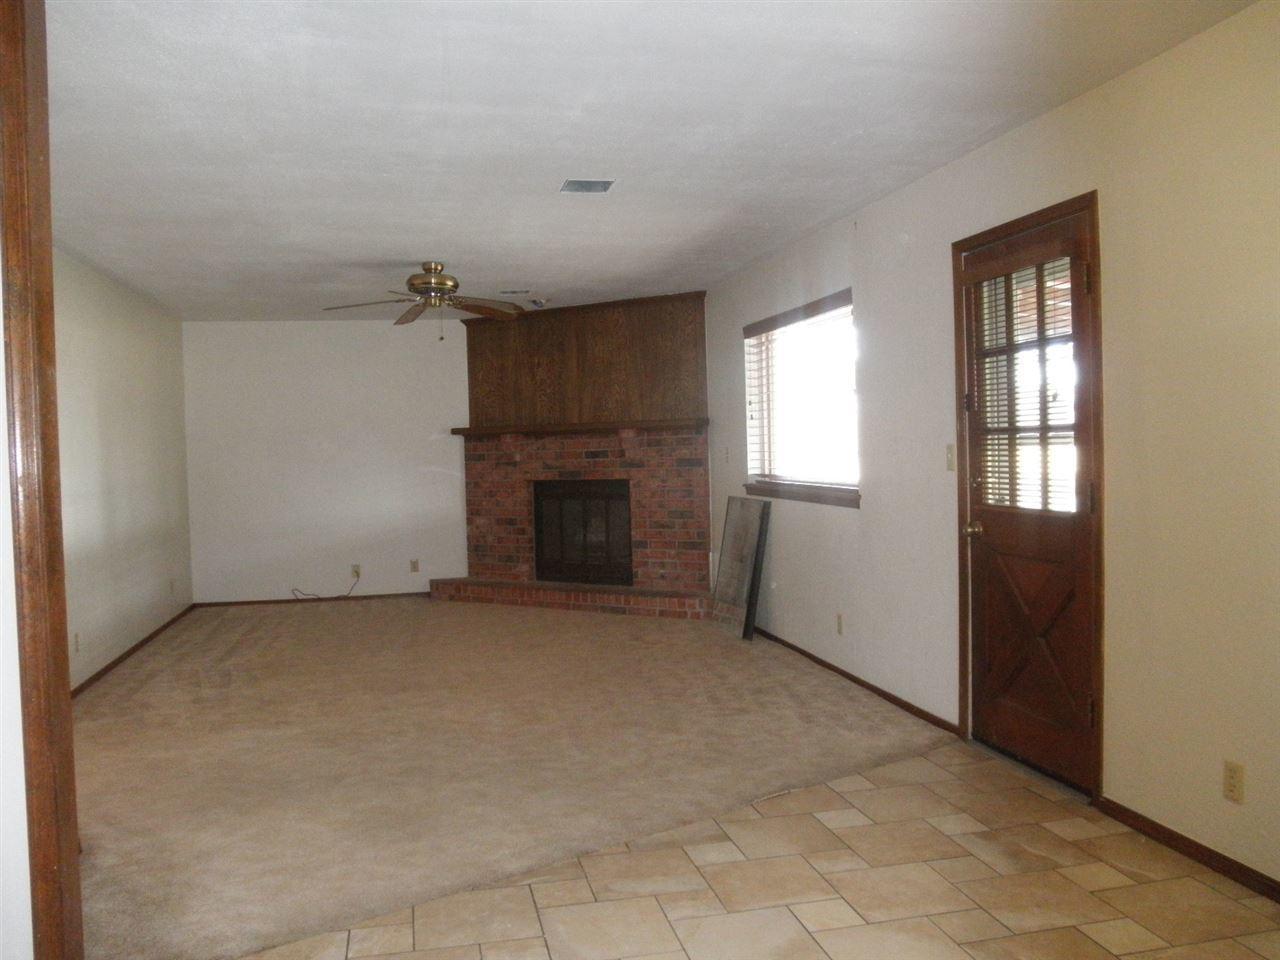 Sold Cross Sale W/ MLS | 310 Lora  Ponca City, OK 74604 3